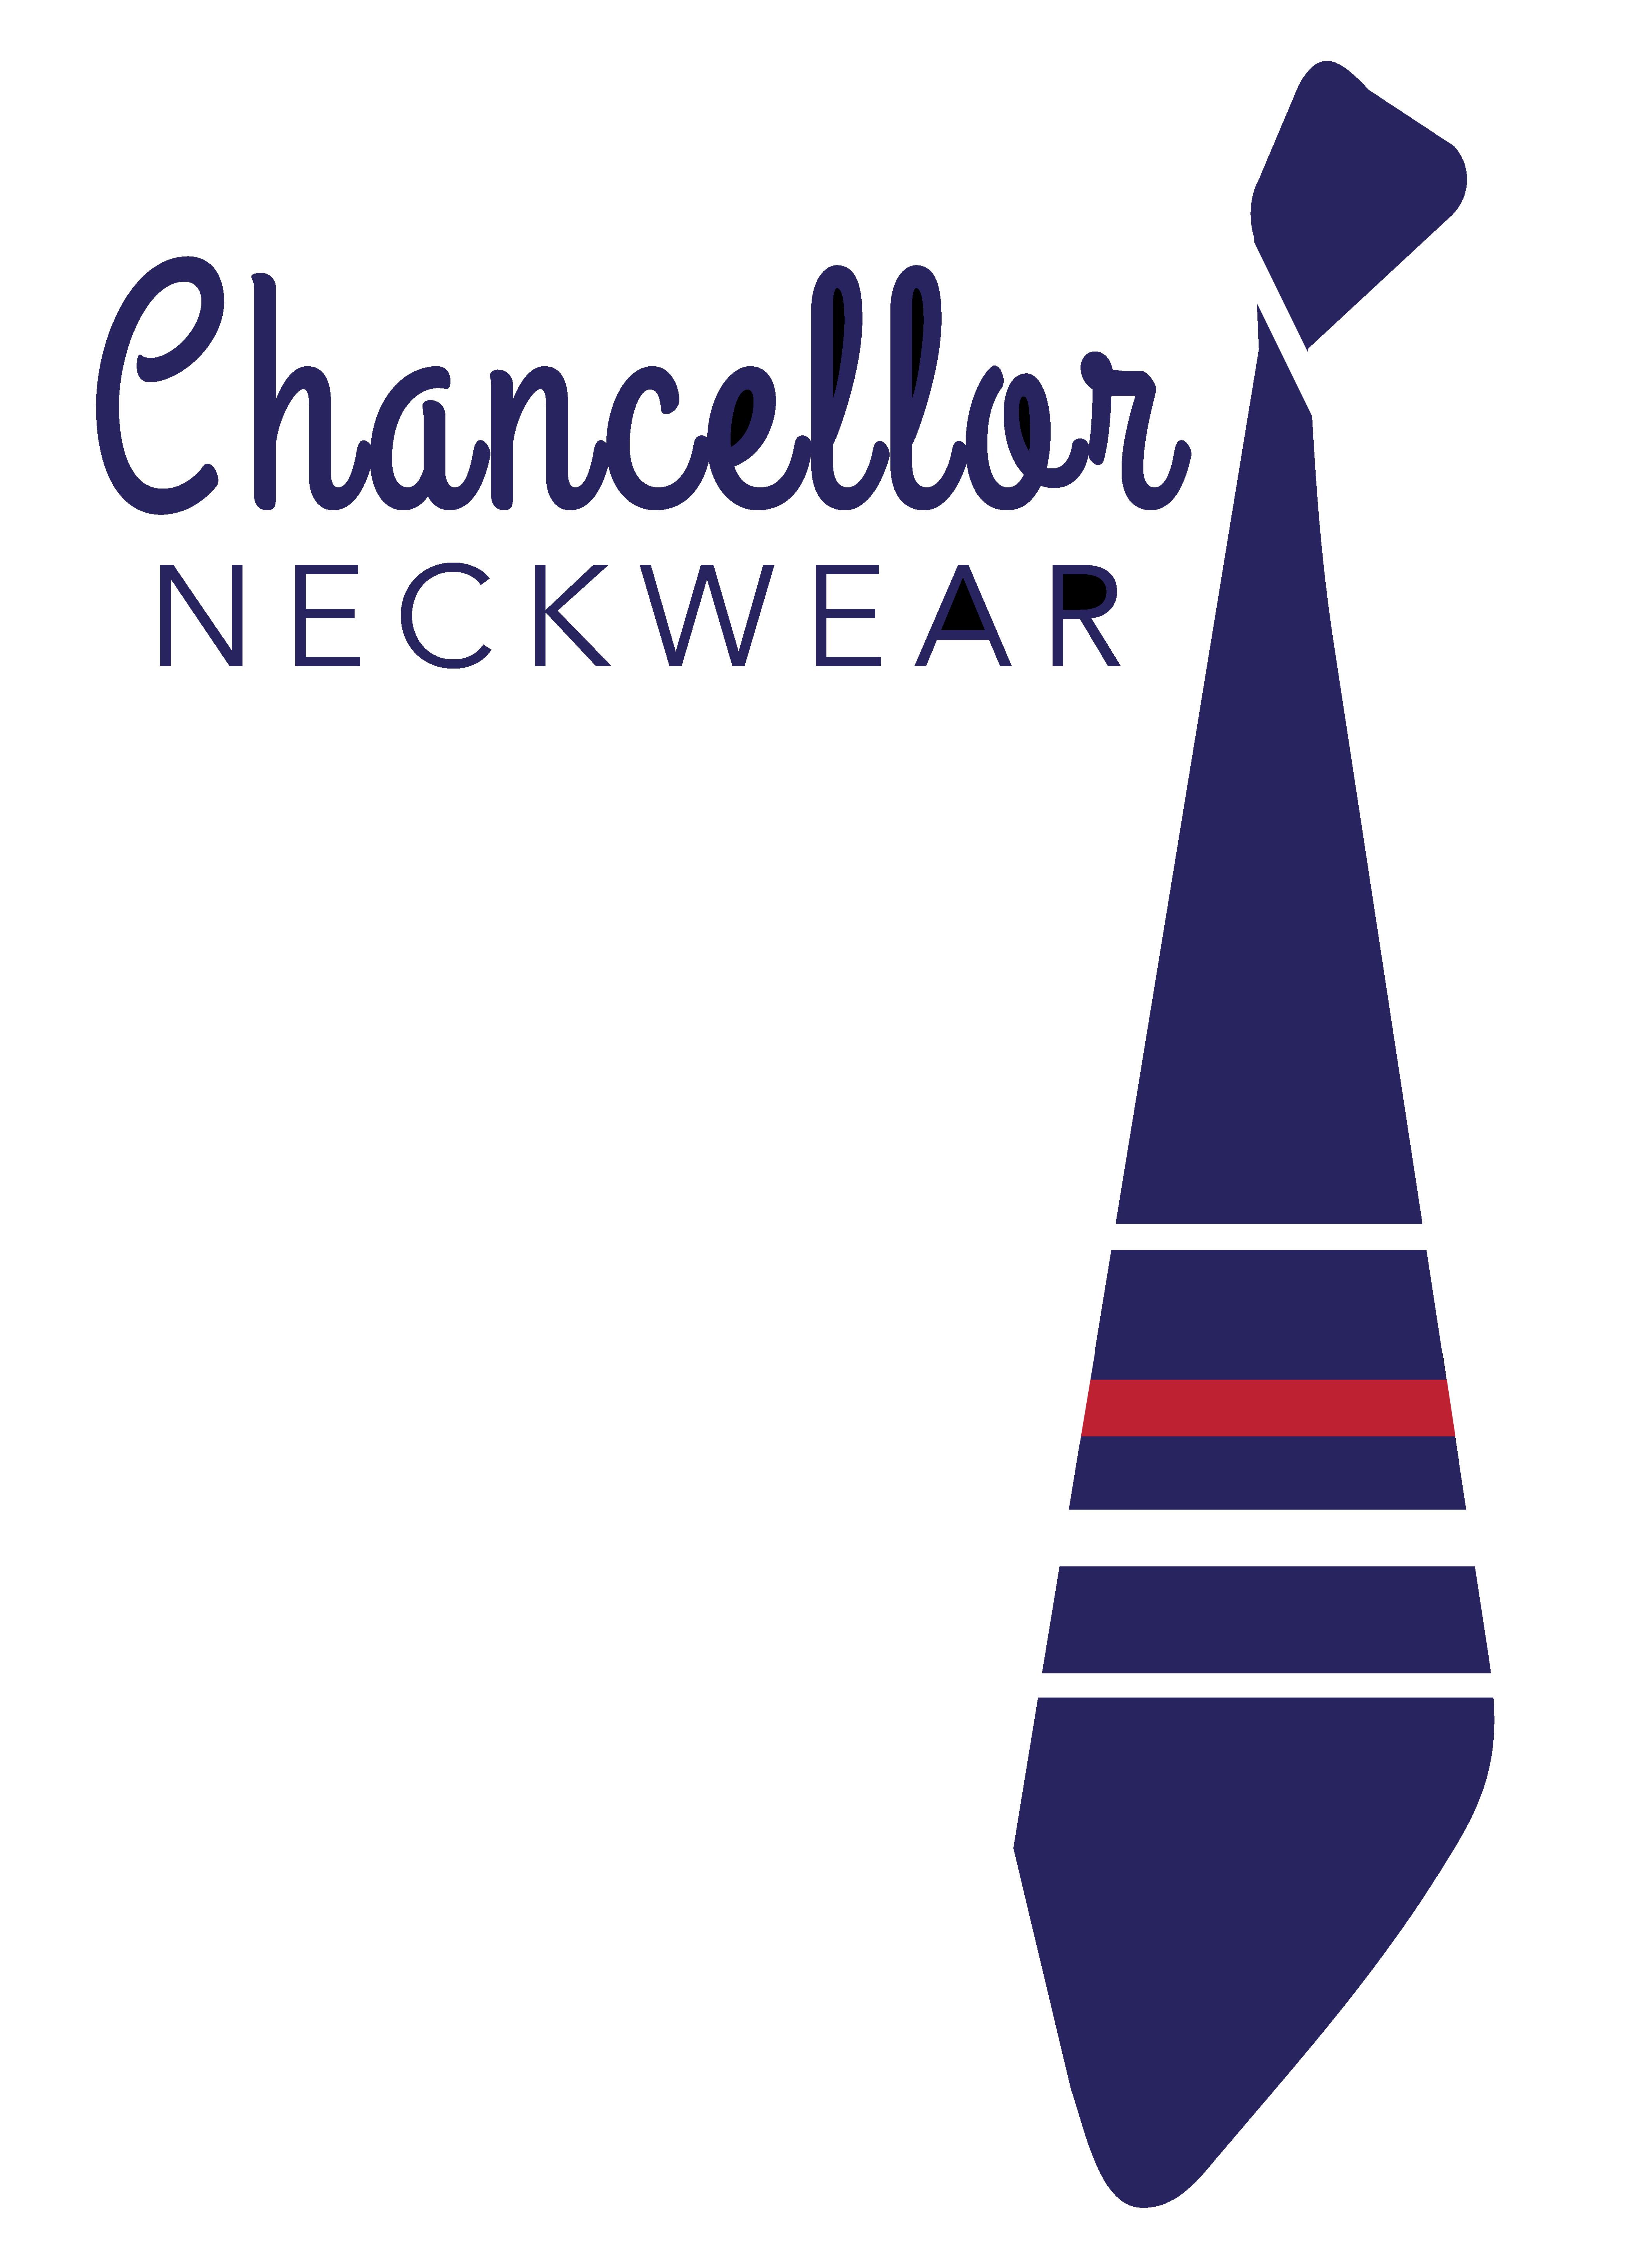 logo_red navy1.png